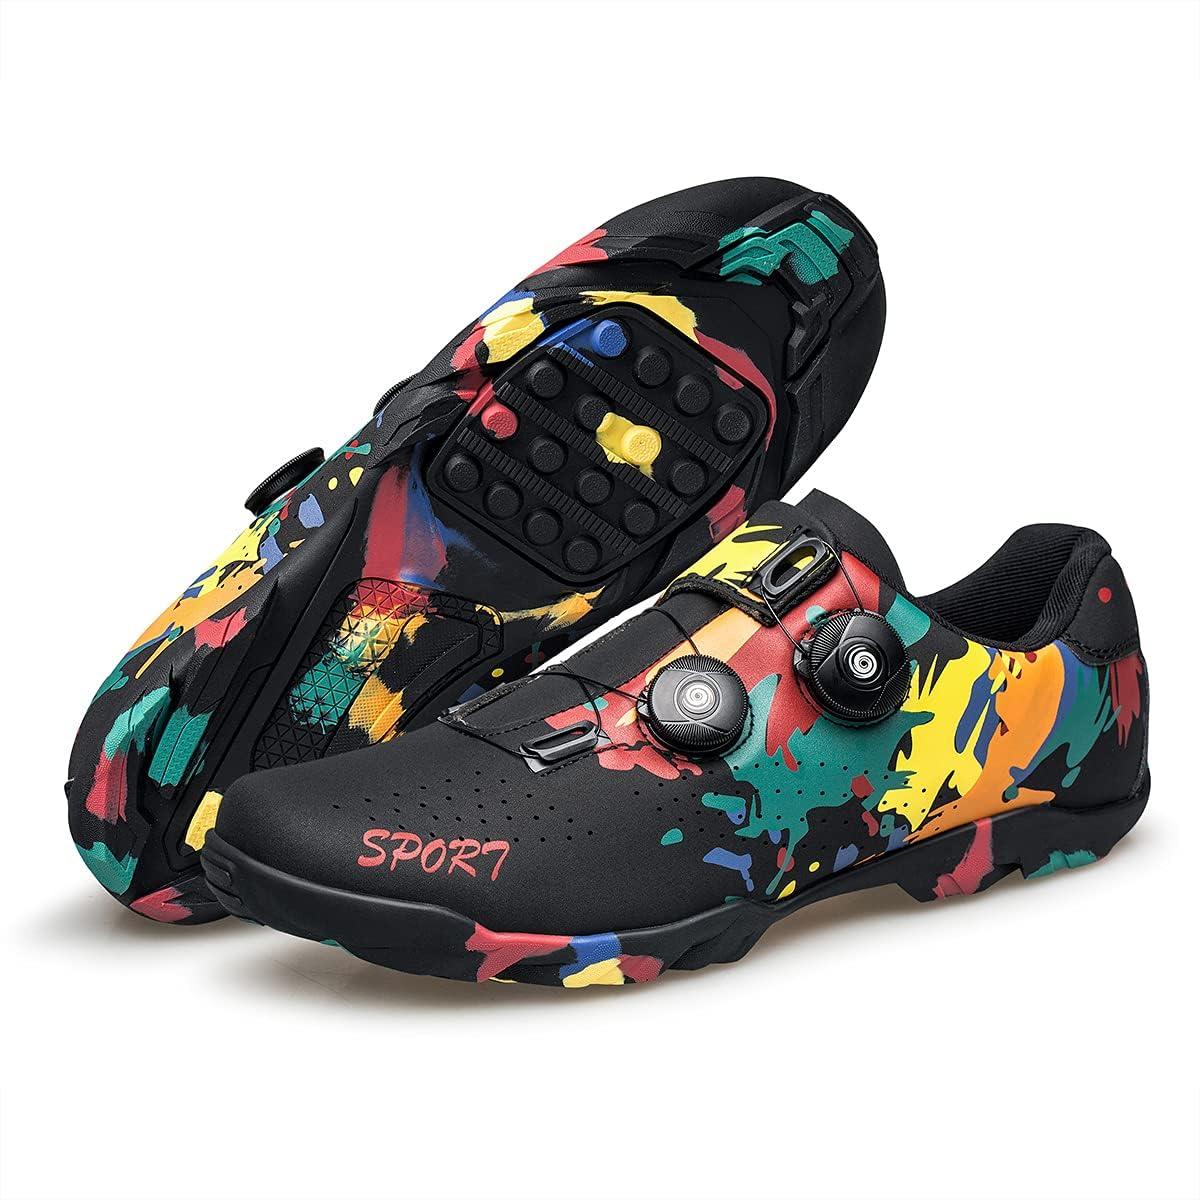 BNV Cycling Long Beach Mall Shoes for Men Graffiti Style Product Sneakers Road Moun Bike